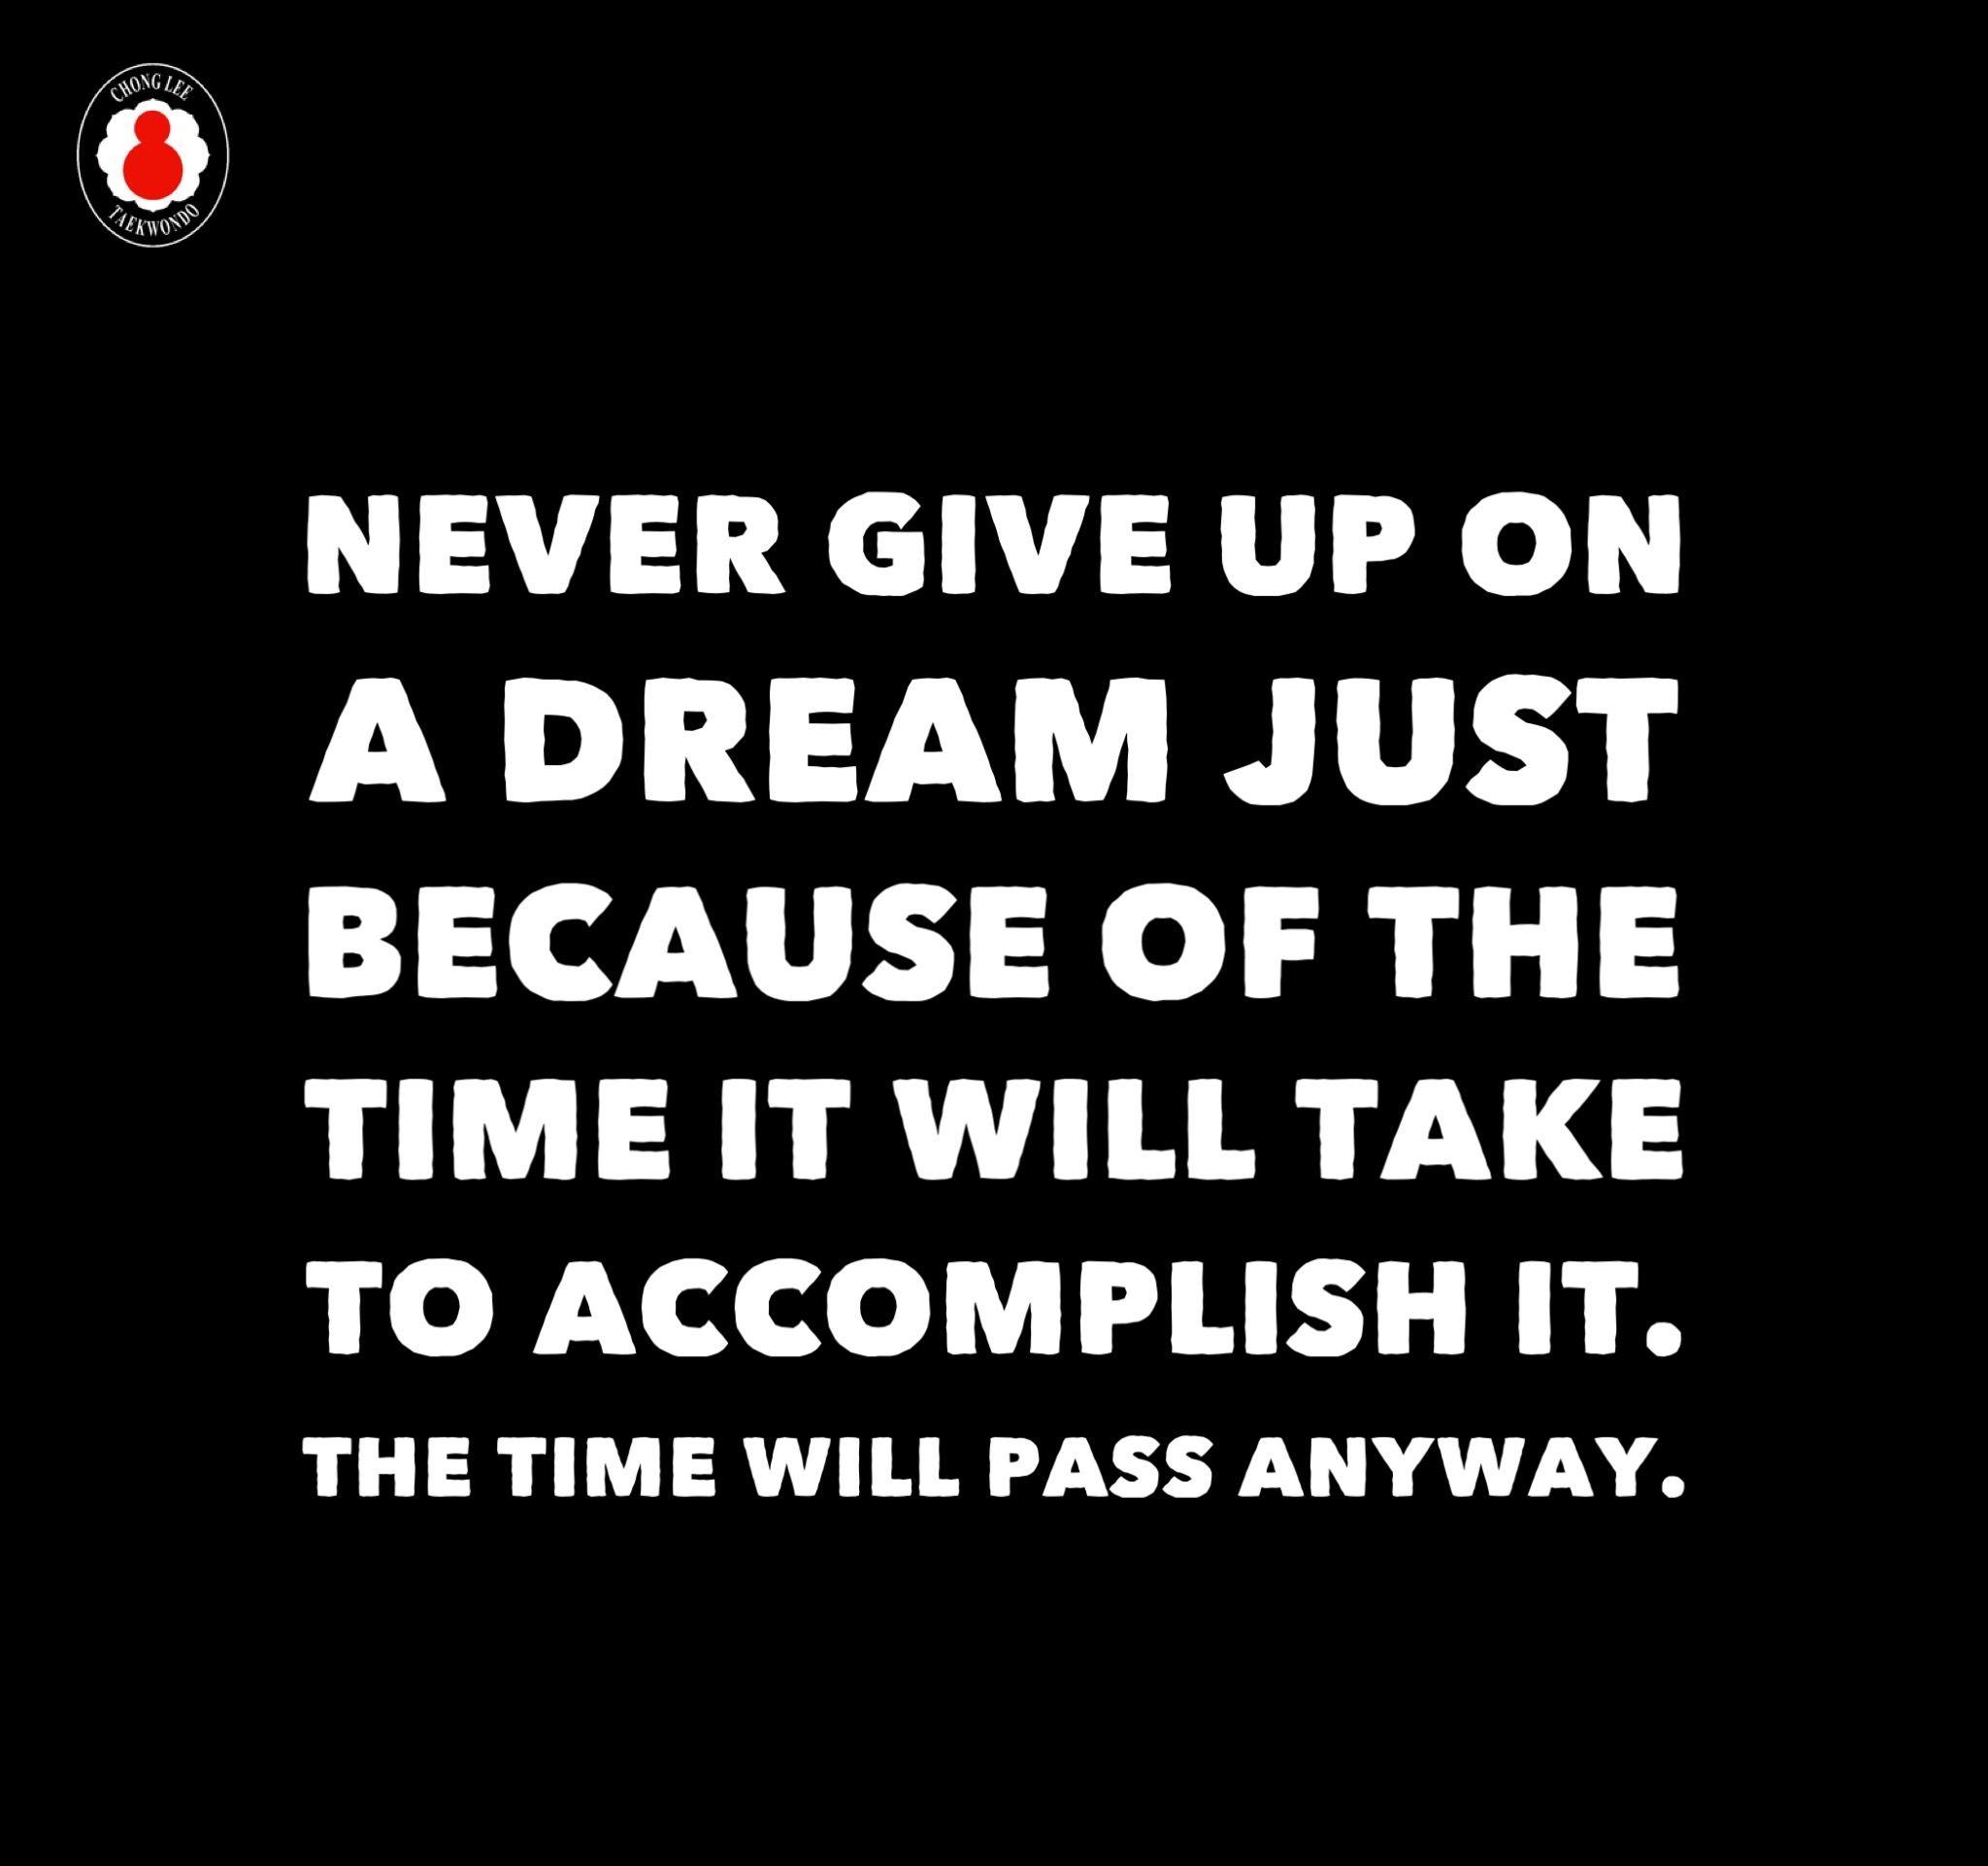 Taekwondo Quotes Never Give Up On A Dream  Chong Lee Taekwondo Quotes  Pinterest